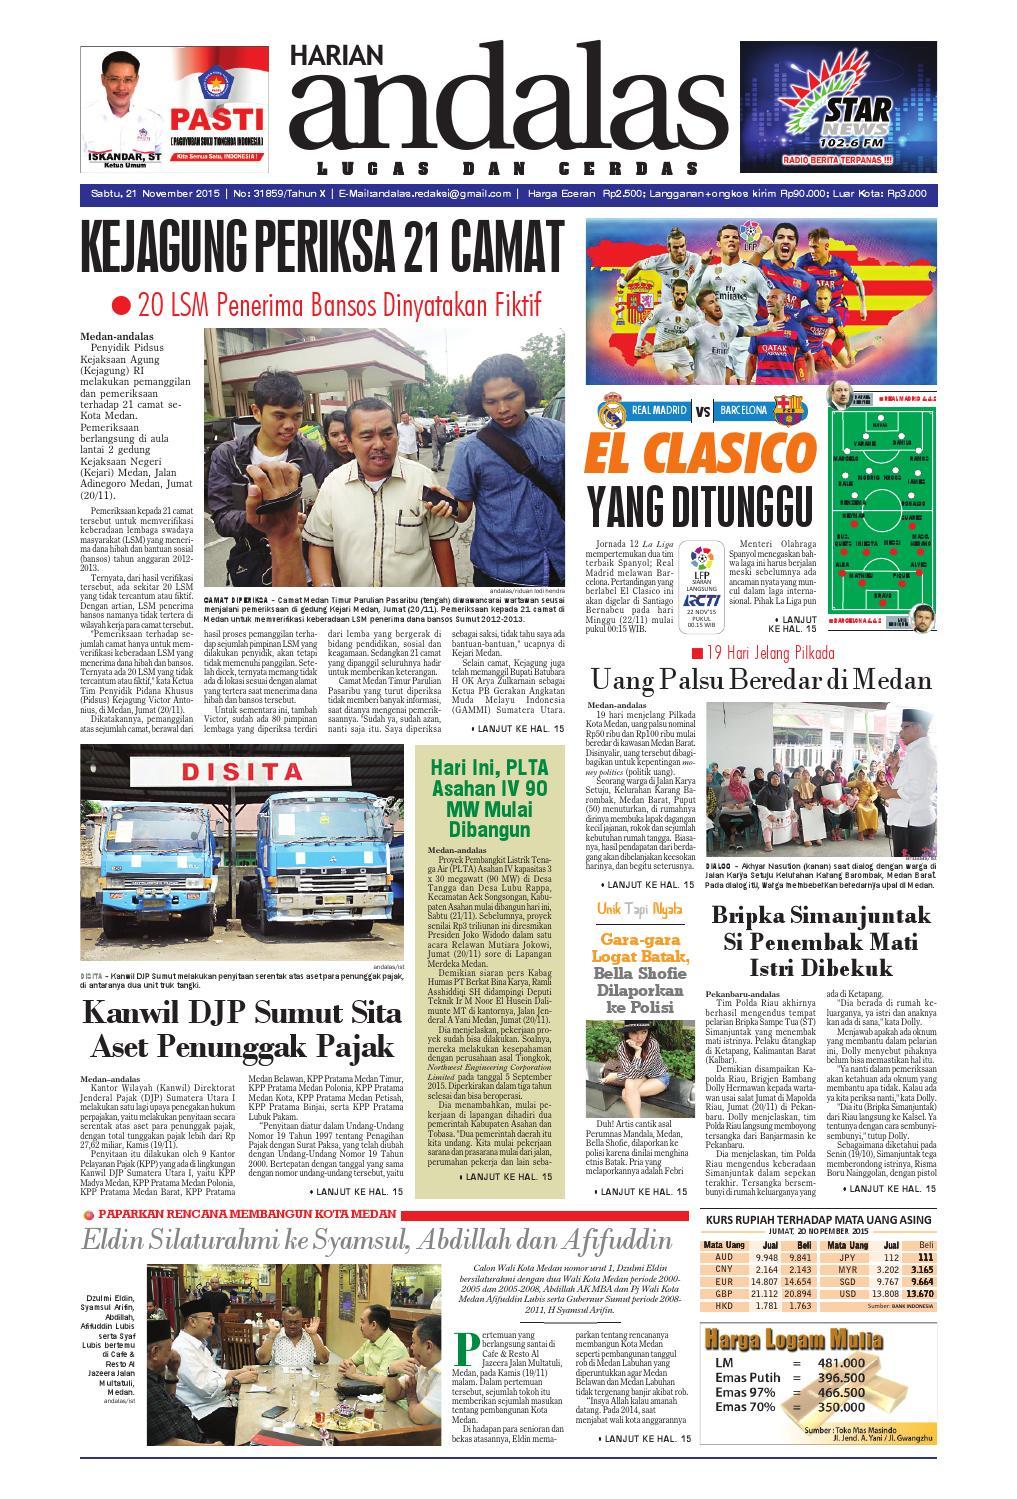 Epaper andalas edisi sabtu 21 november 2015 by media andalas - issuu a3bb6d5ec3